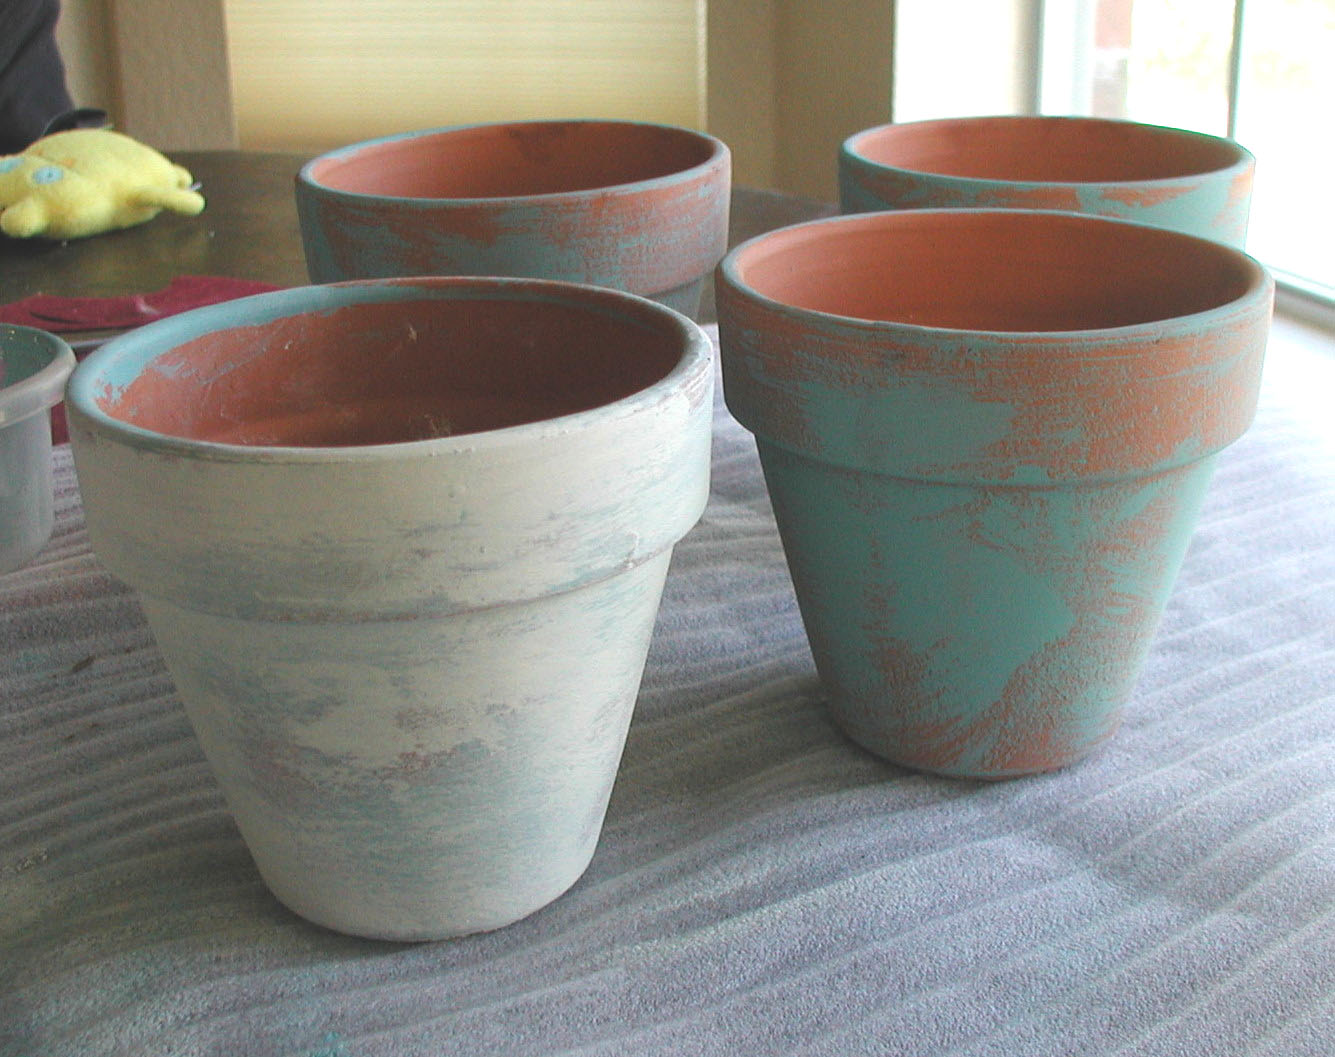 Can I Paint Terracotta Pots